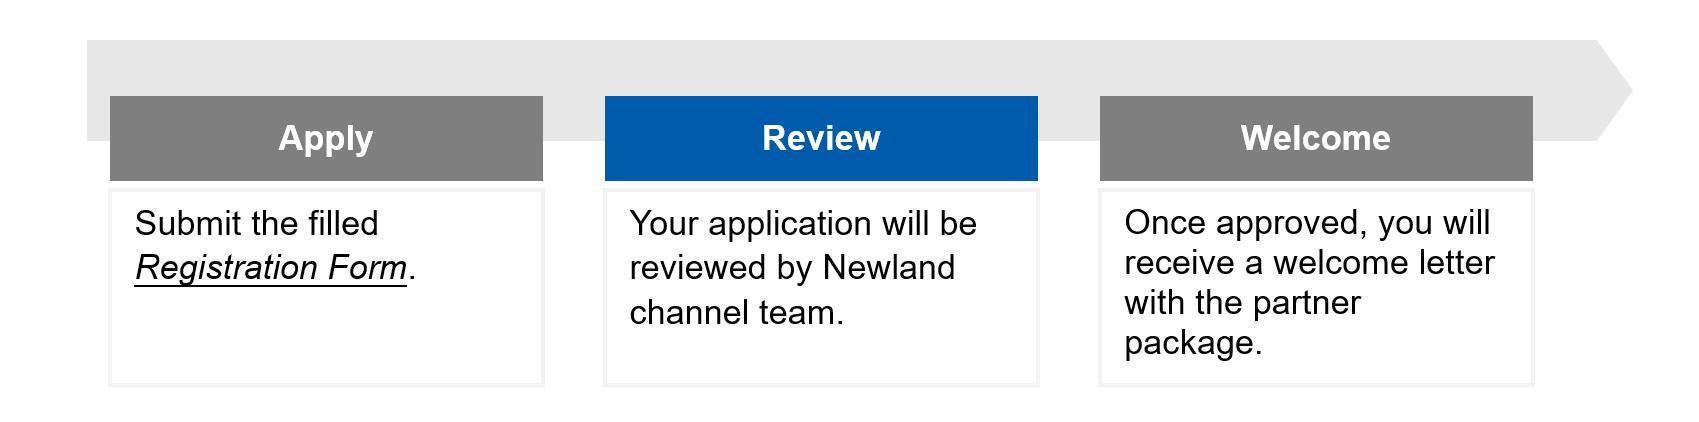 20200324 Newland Parter Program Application.jpg